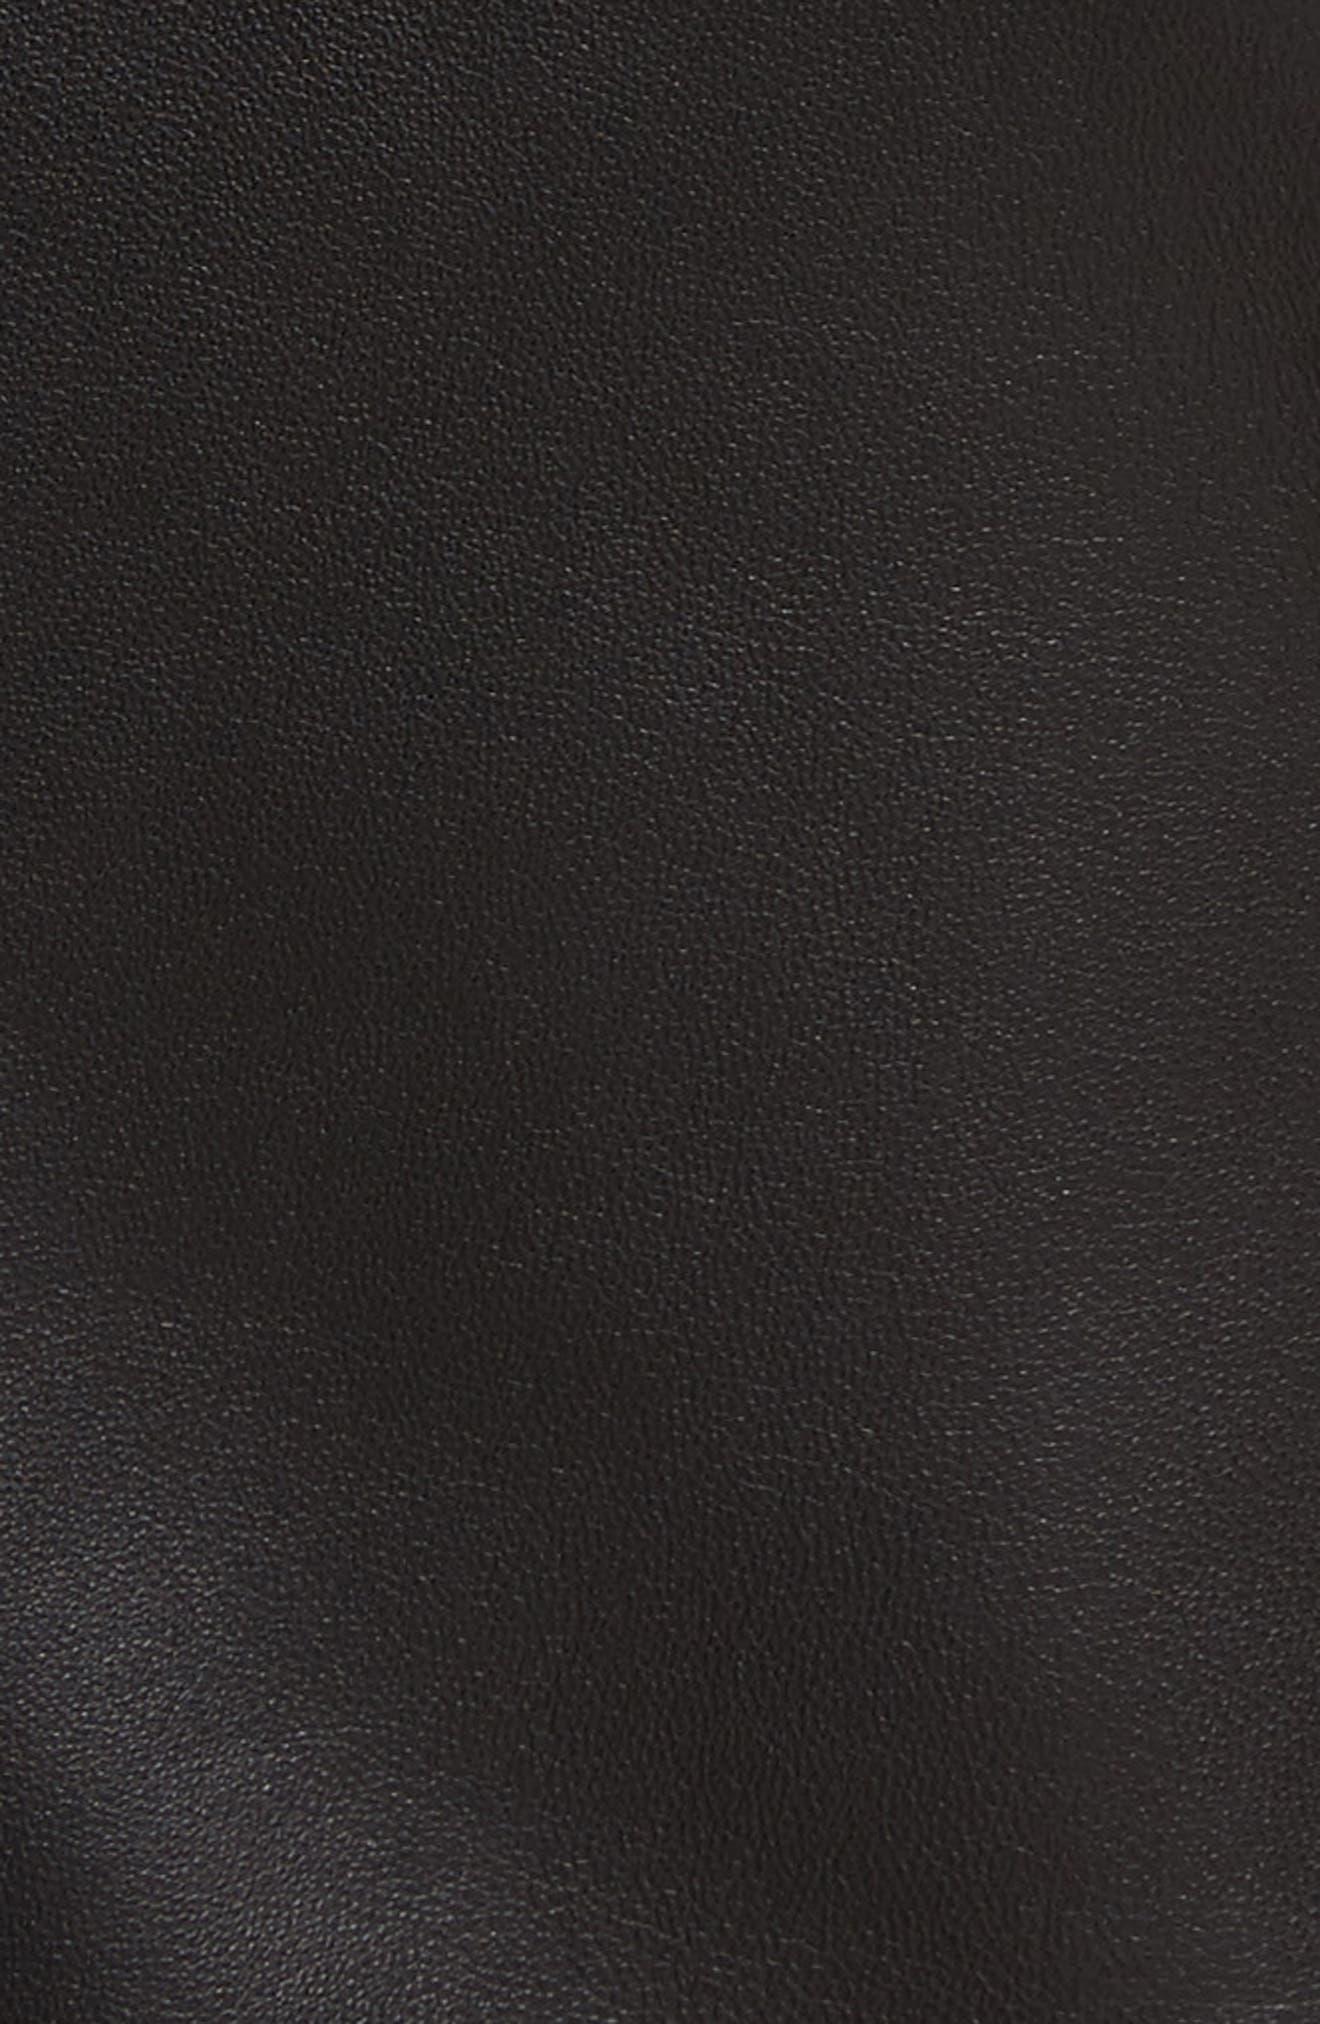 Mollison Leather Moto Jacket,                             Alternate thumbnail 14, color,